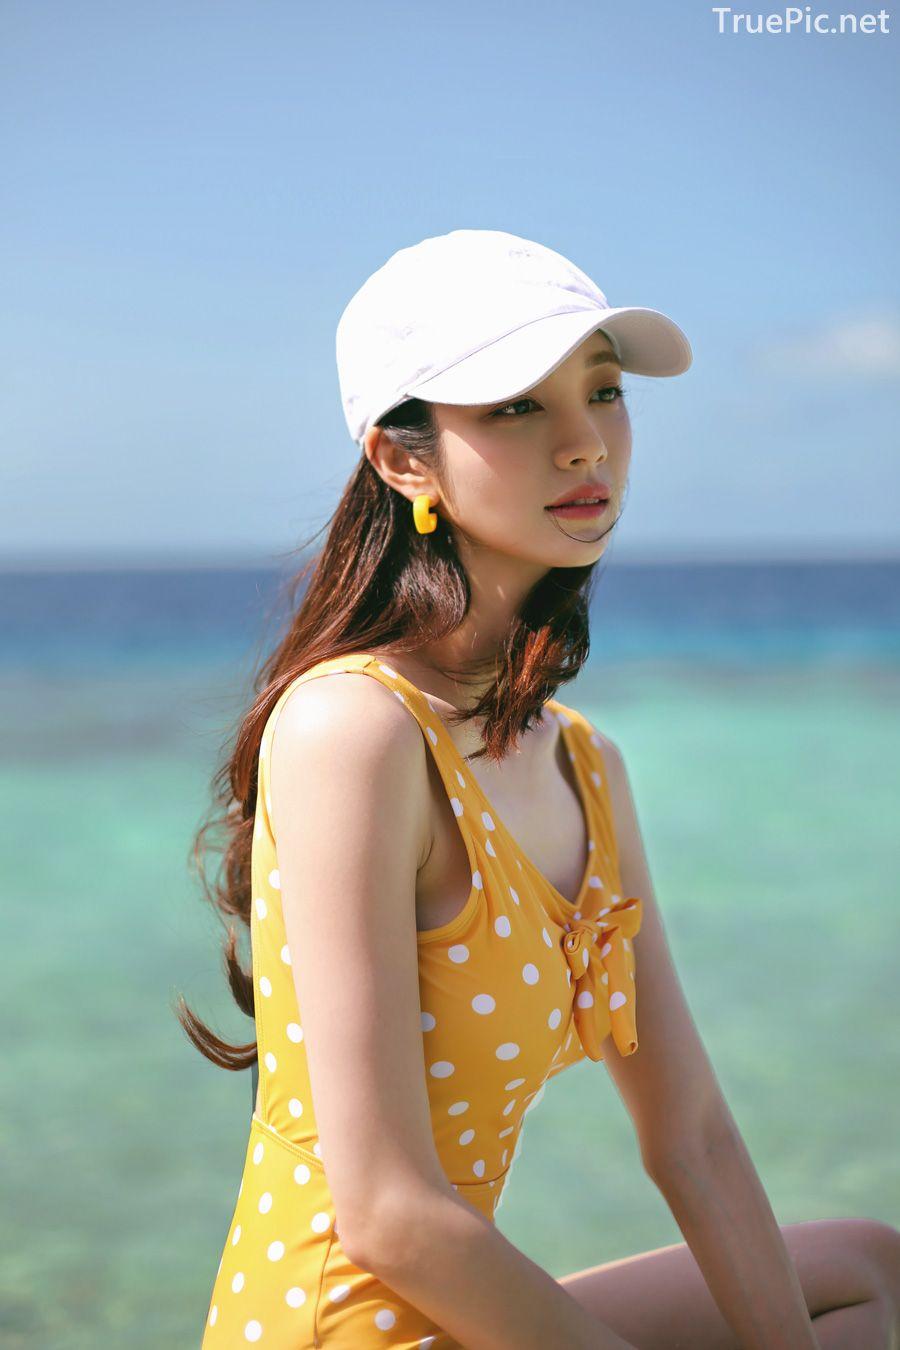 Korean fashion model Jeong Hee - Everyone once a monokini - Picture 7